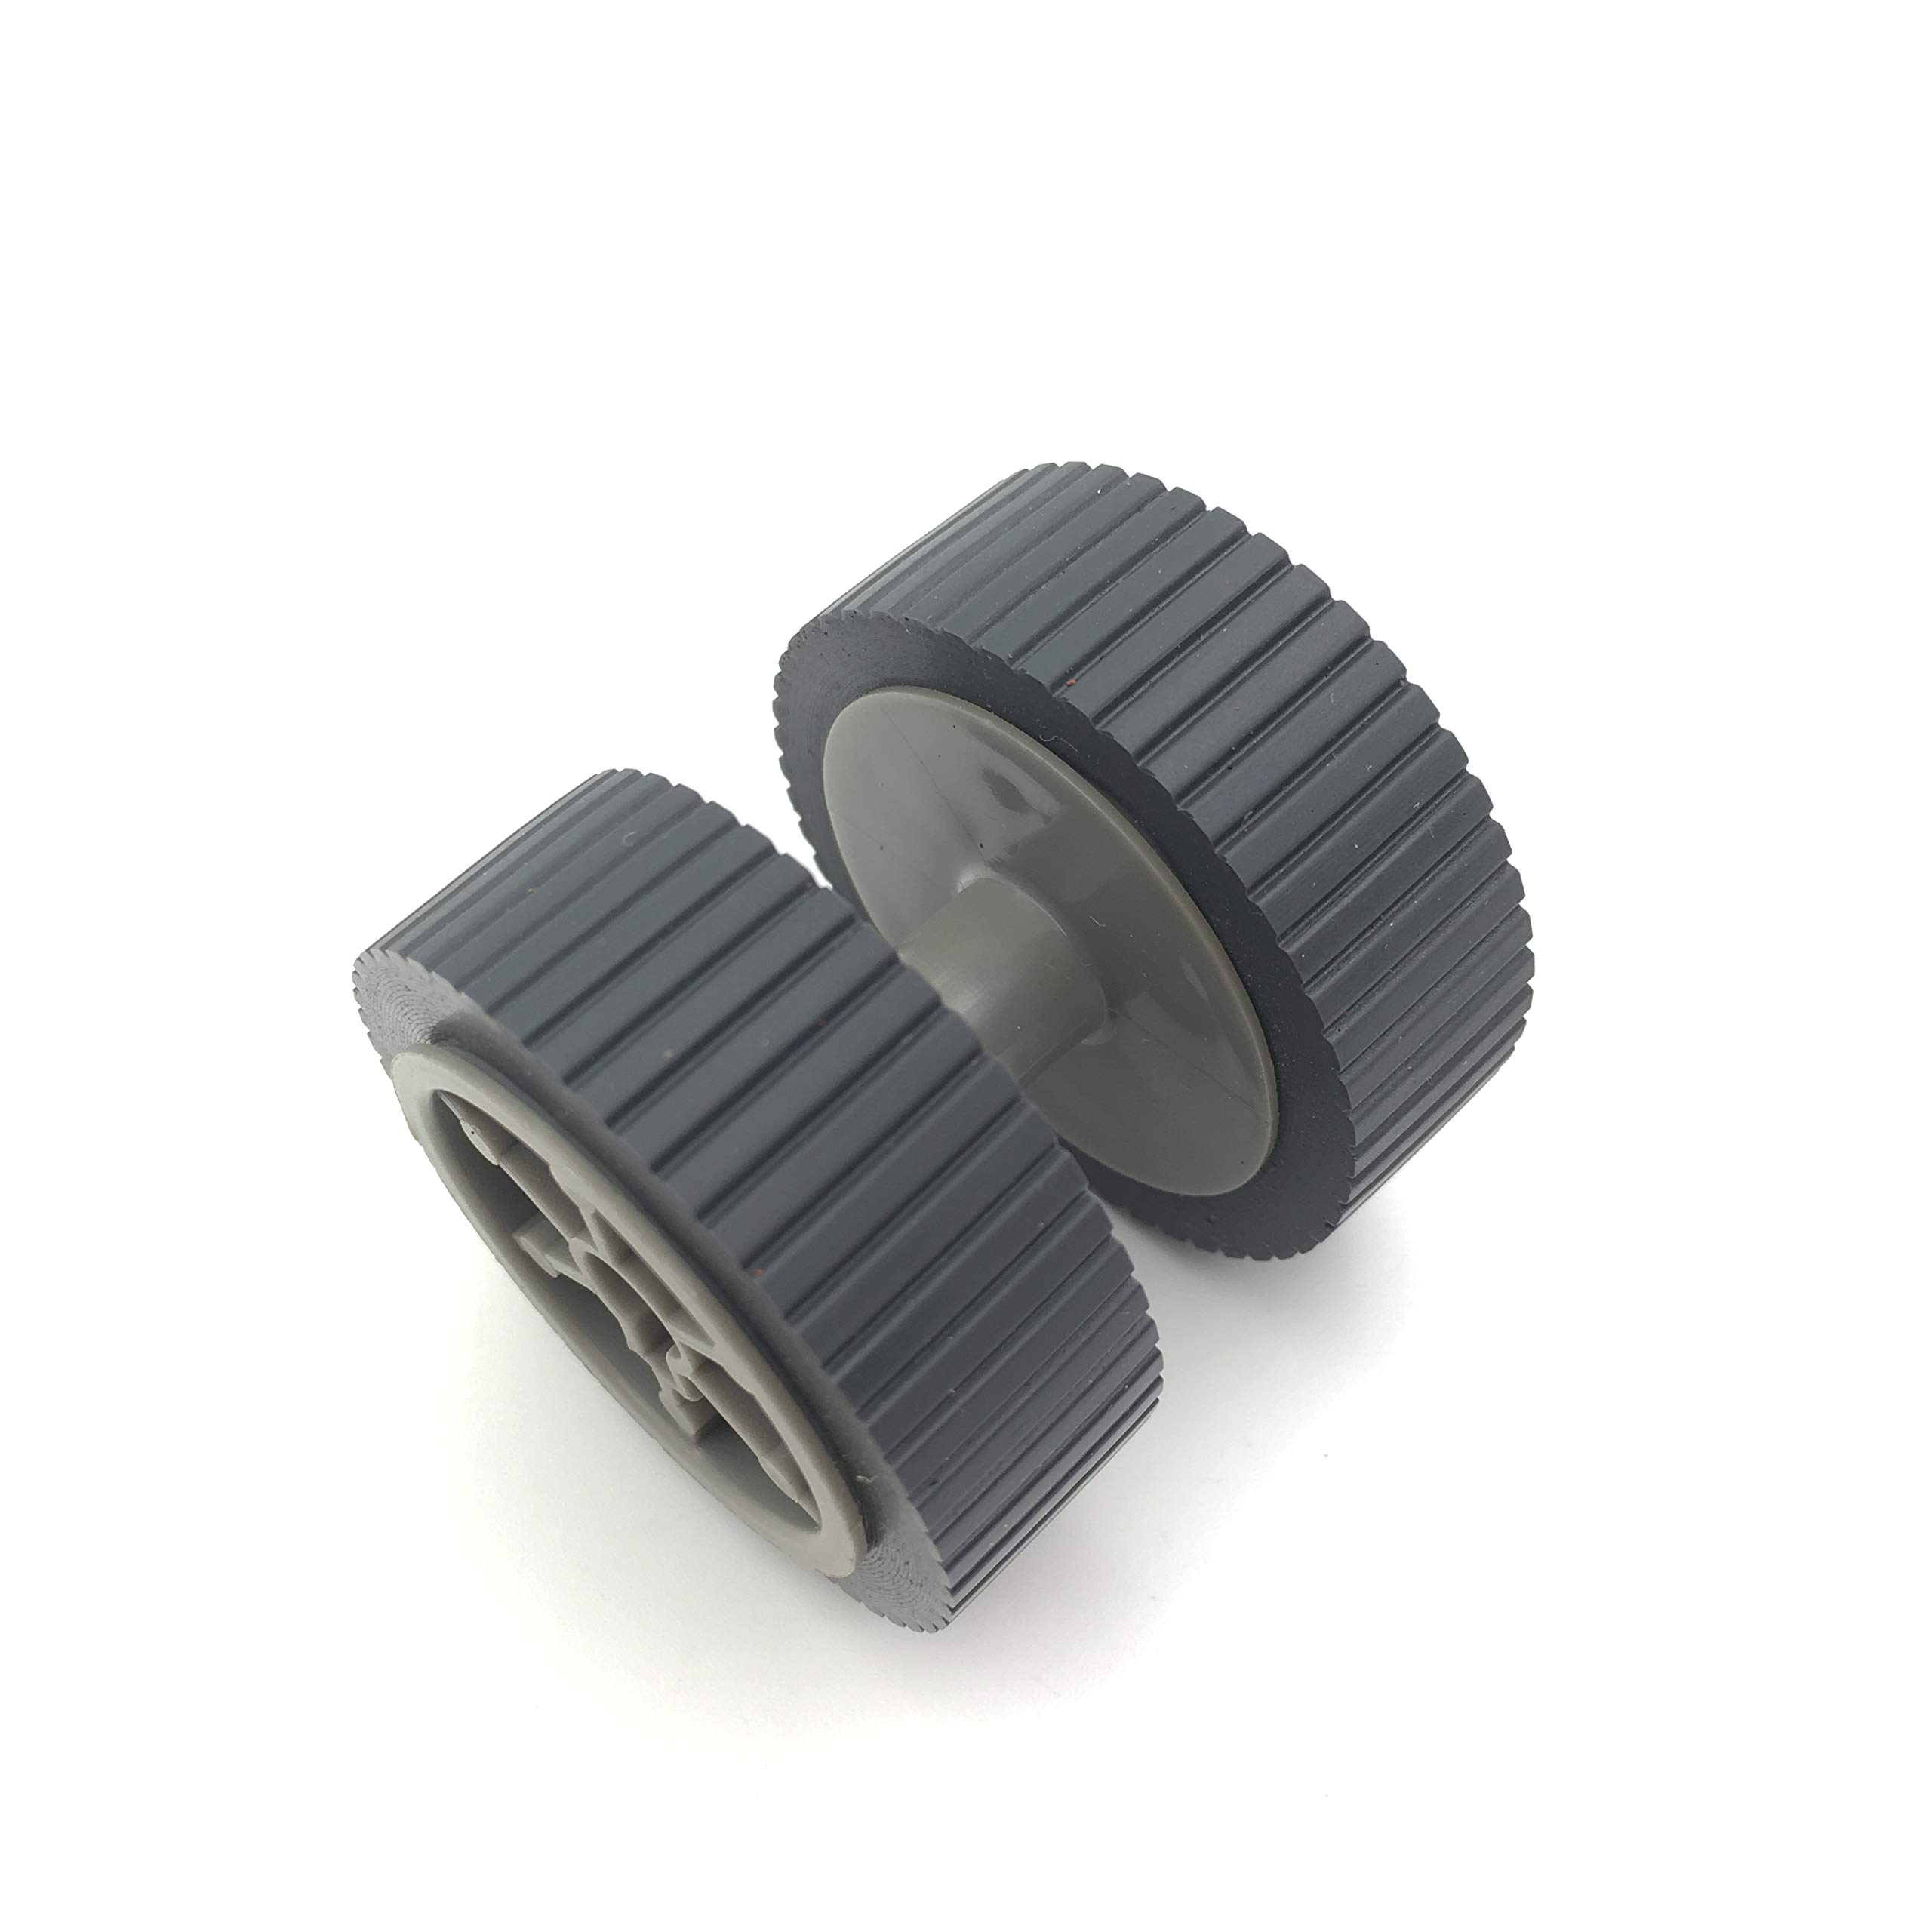 OKLILI PA03540-0002 Pick Pickup Roller for Fujitsu fi-6130 fi-6230 fi-6130Z fi-6125 fi-6230Z fi-6140 fi-6140Z fi-6240 fi-6240Z fi-6225